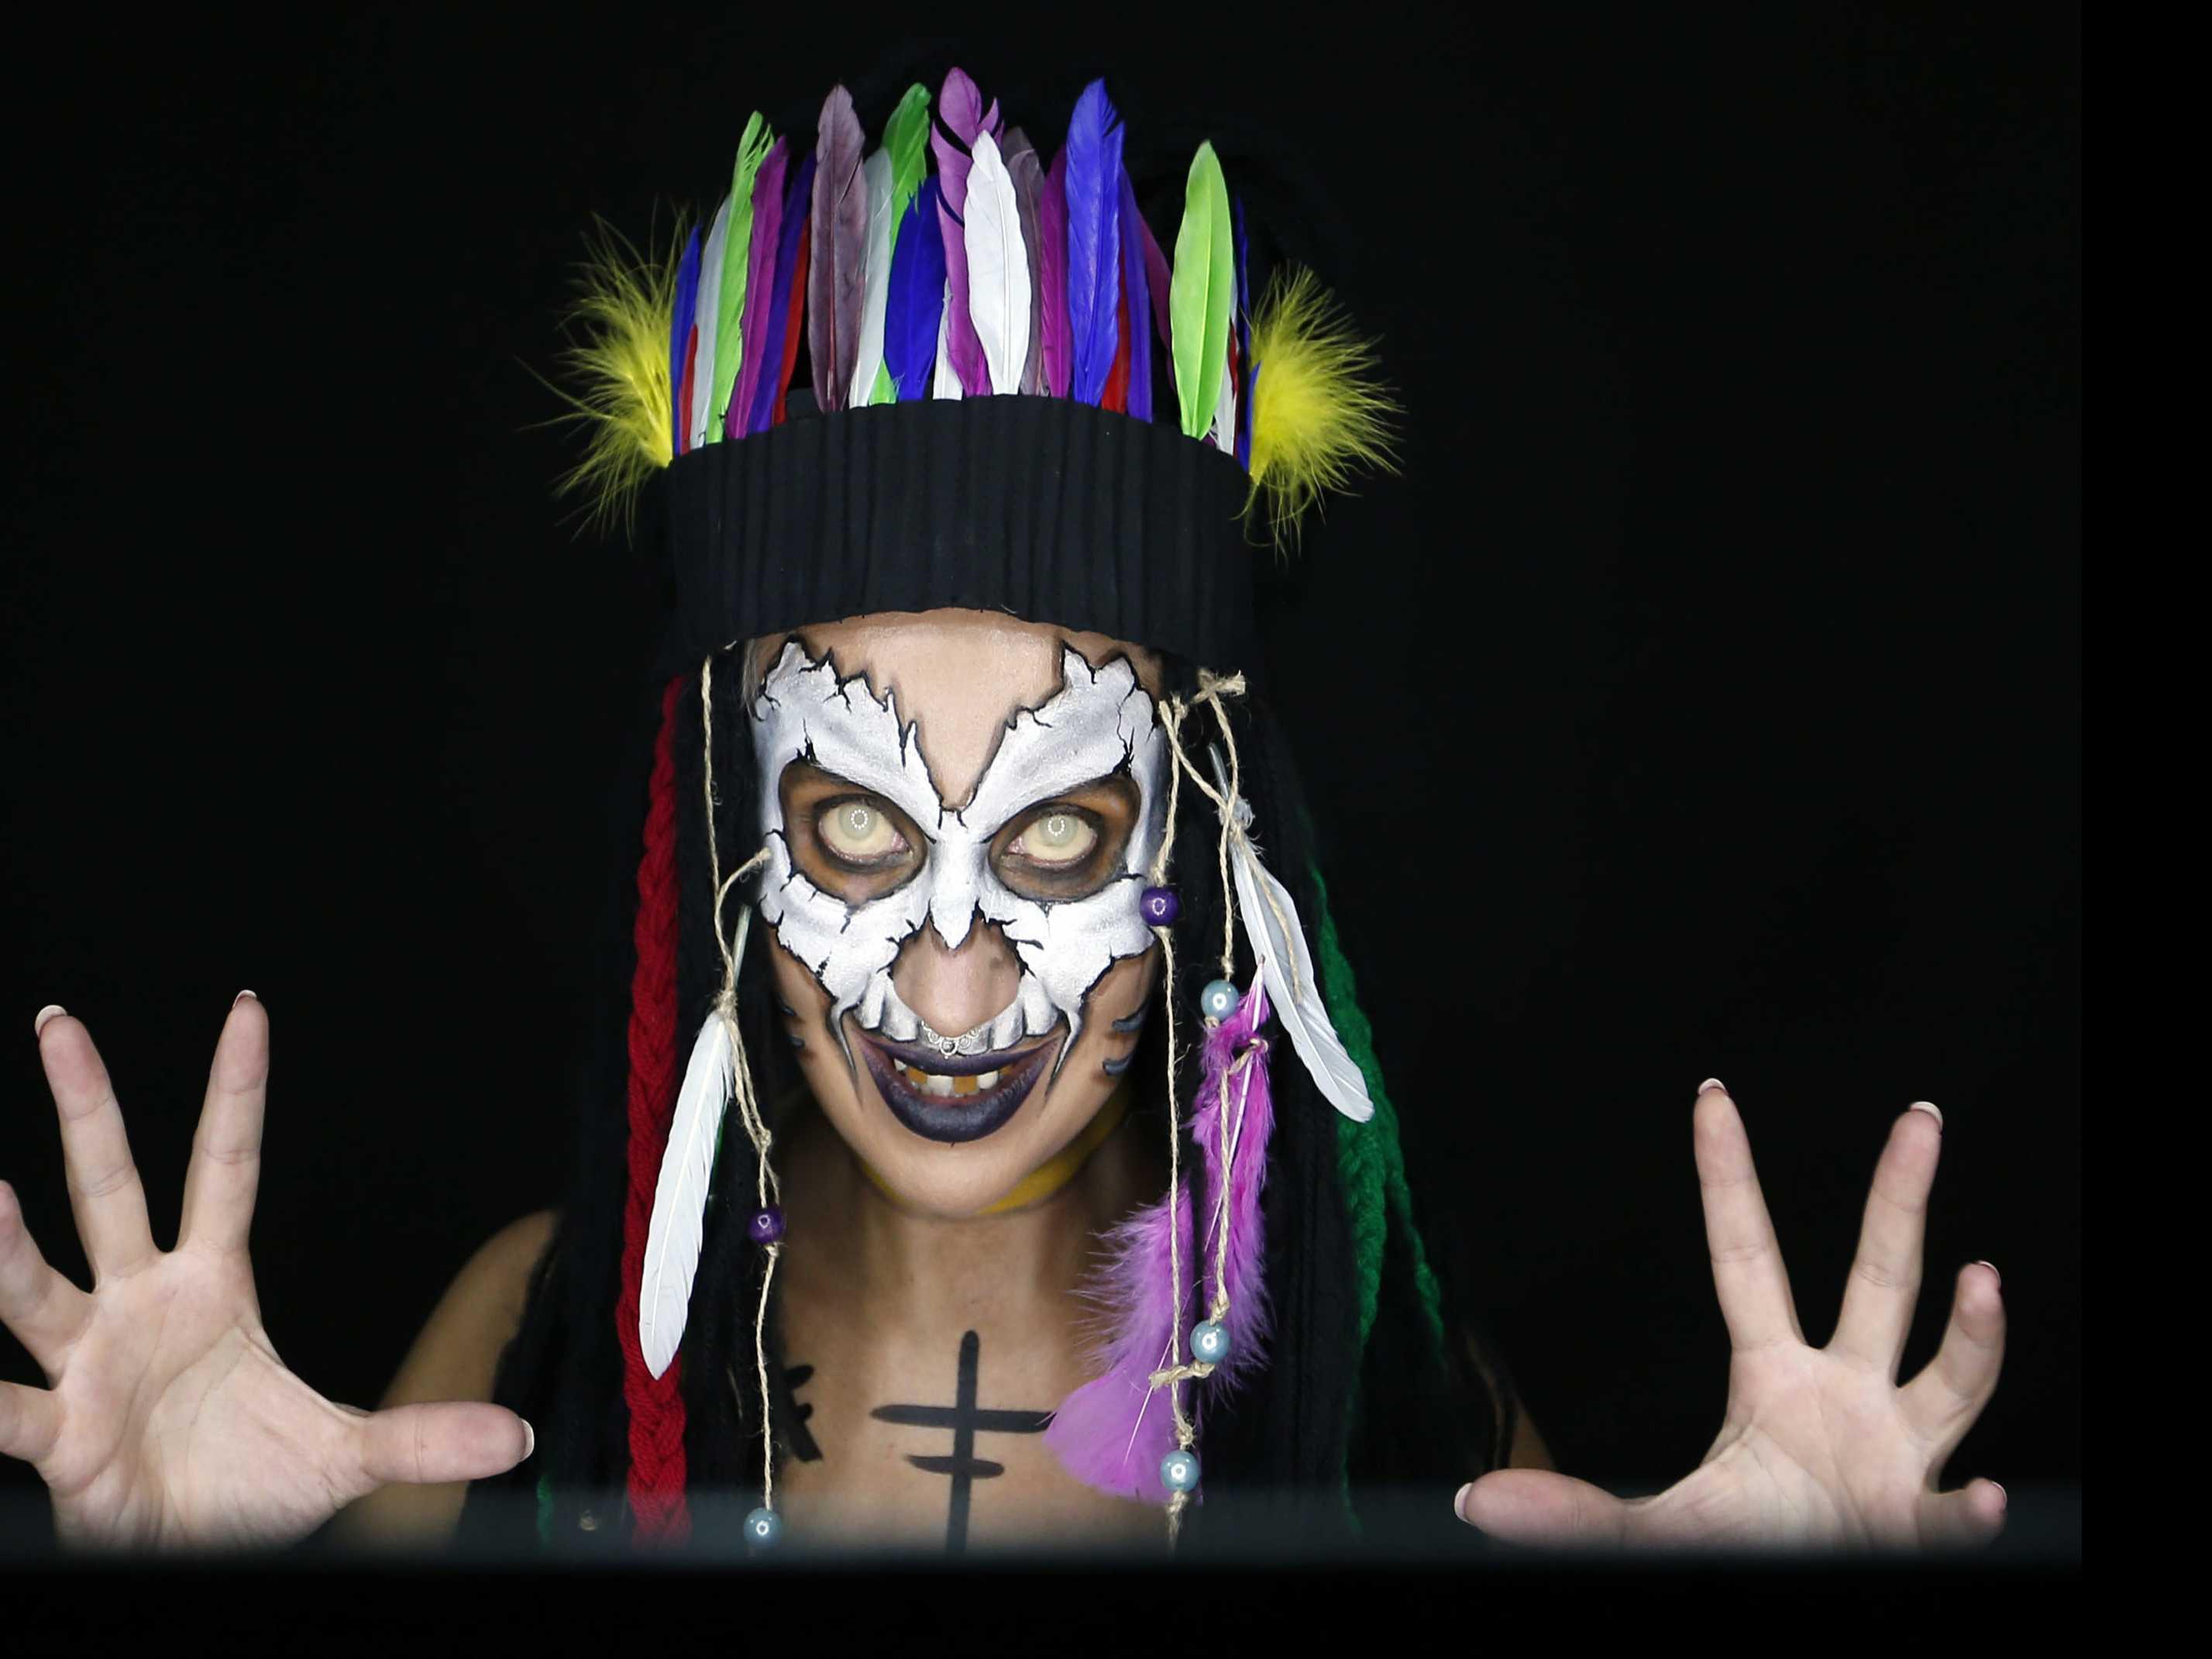 Art of Illusion: Face Paint Transforms Serbian Makeup Pro